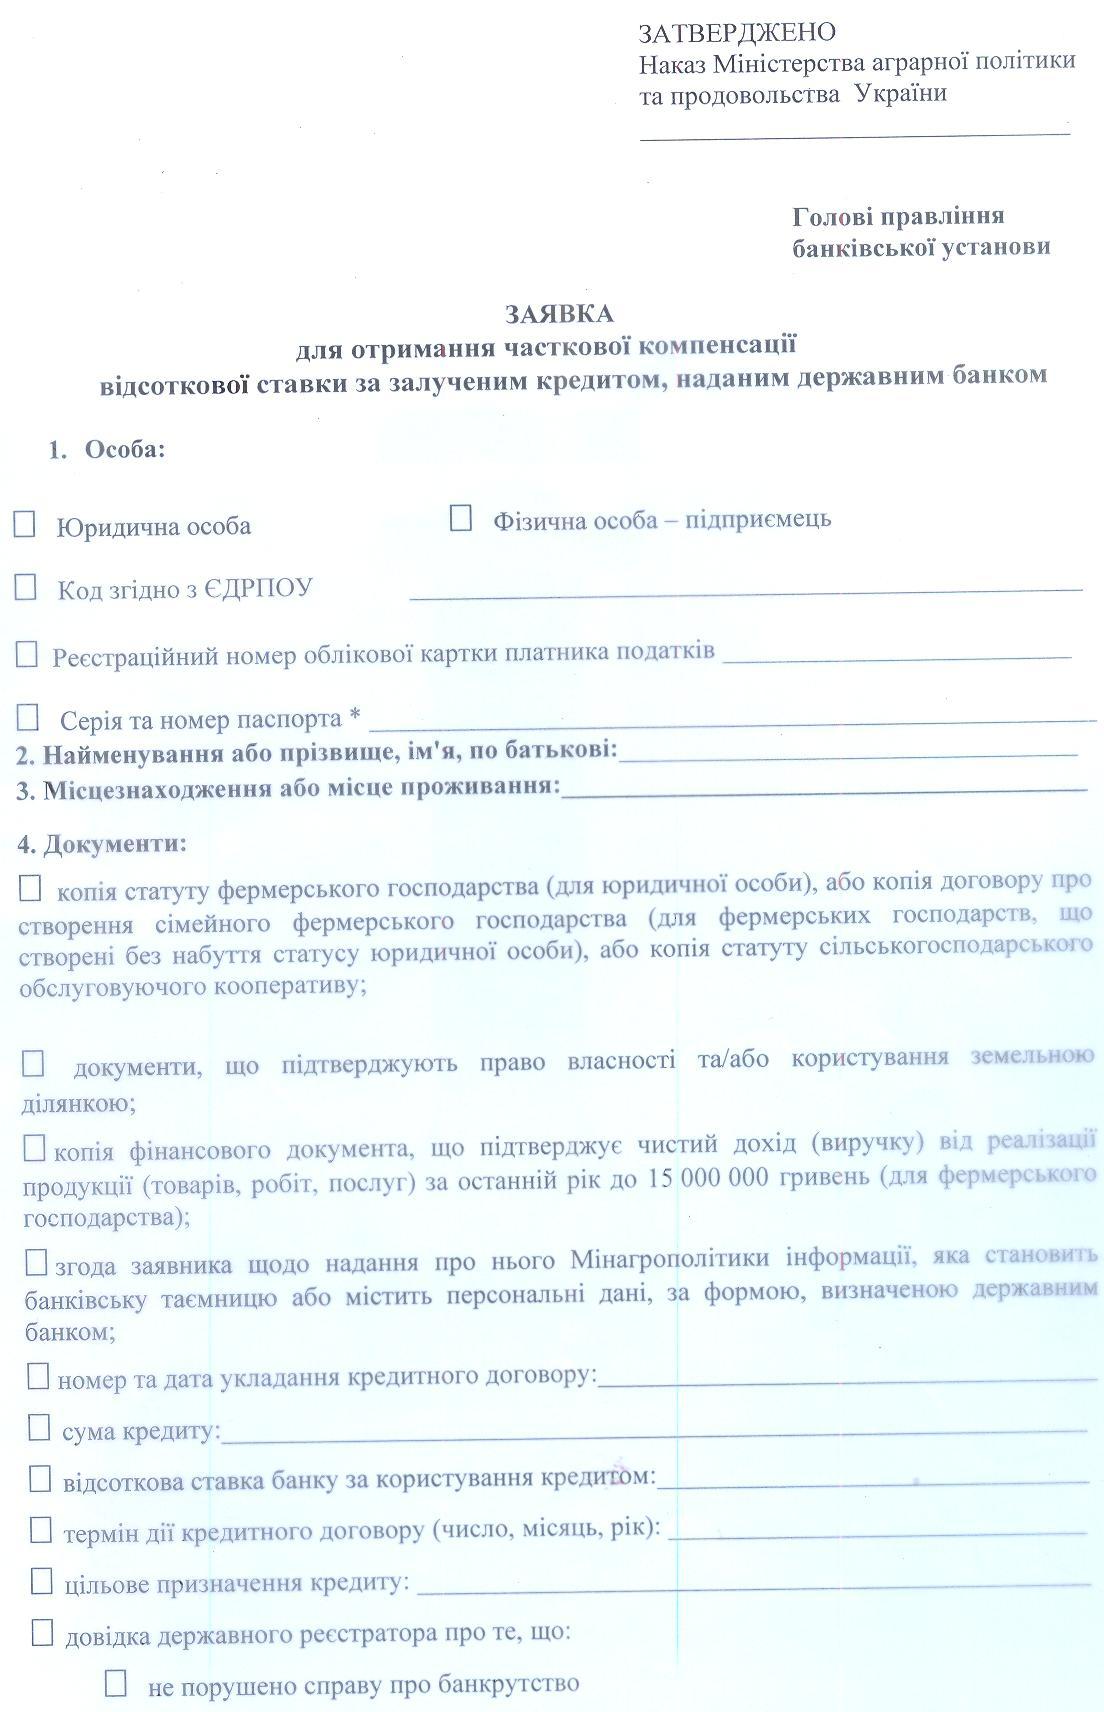 Наказ № 150 заявка кредит